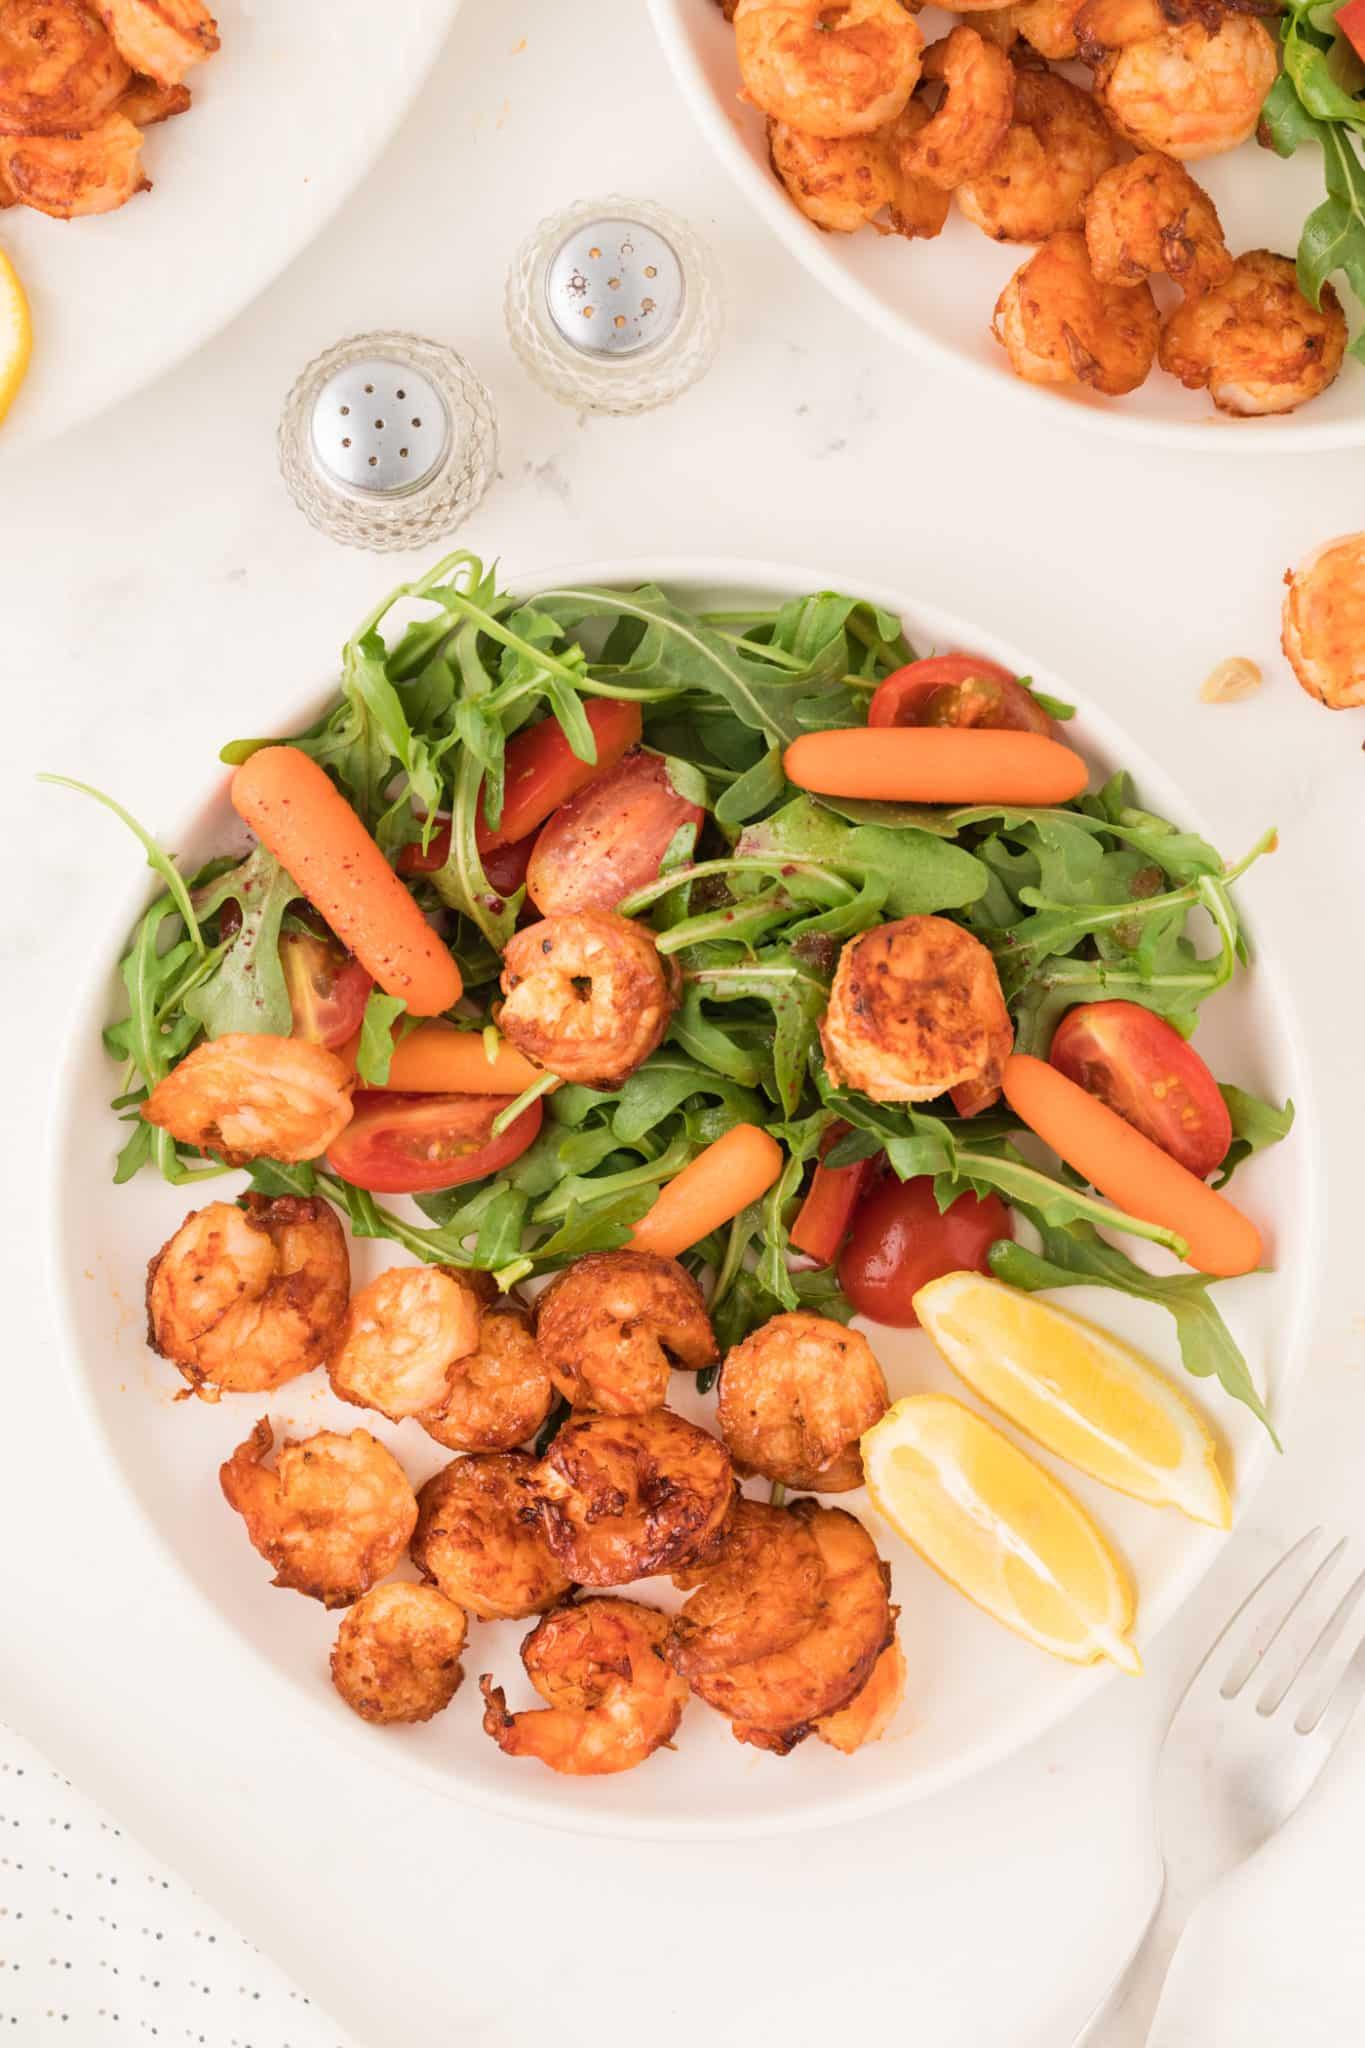 Lemon garlic shrimp with salad on a plate